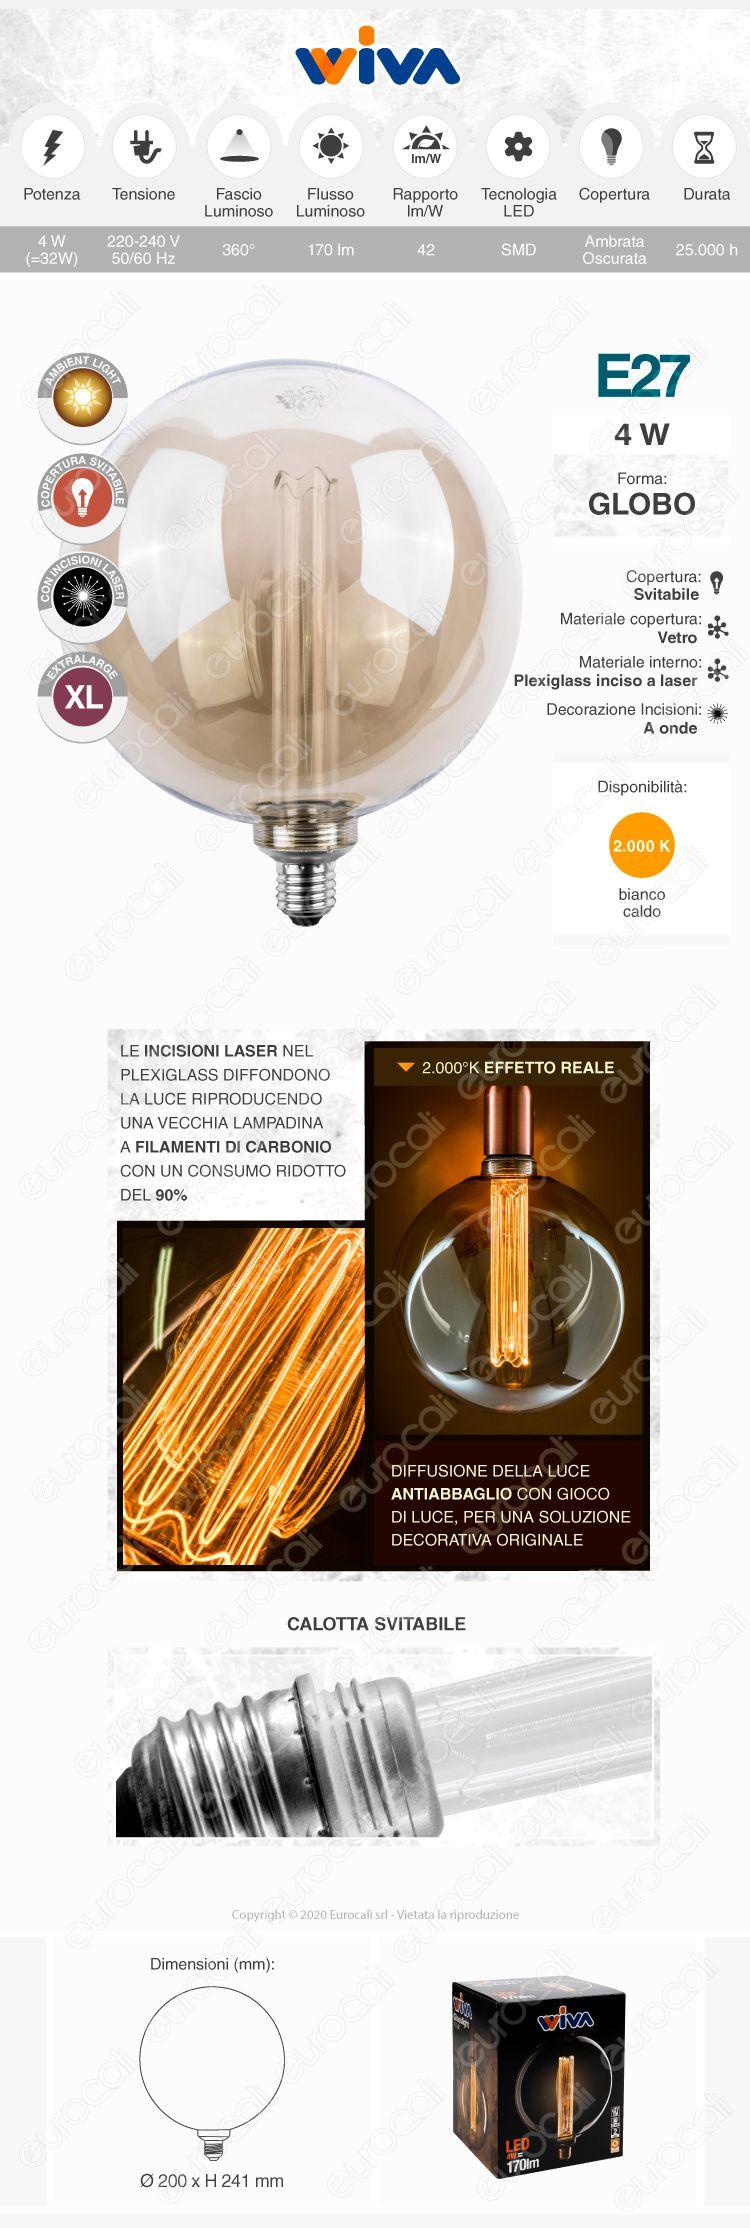 Wiva GlassLight Fumè Lampadina LED E27 4W Globo G200